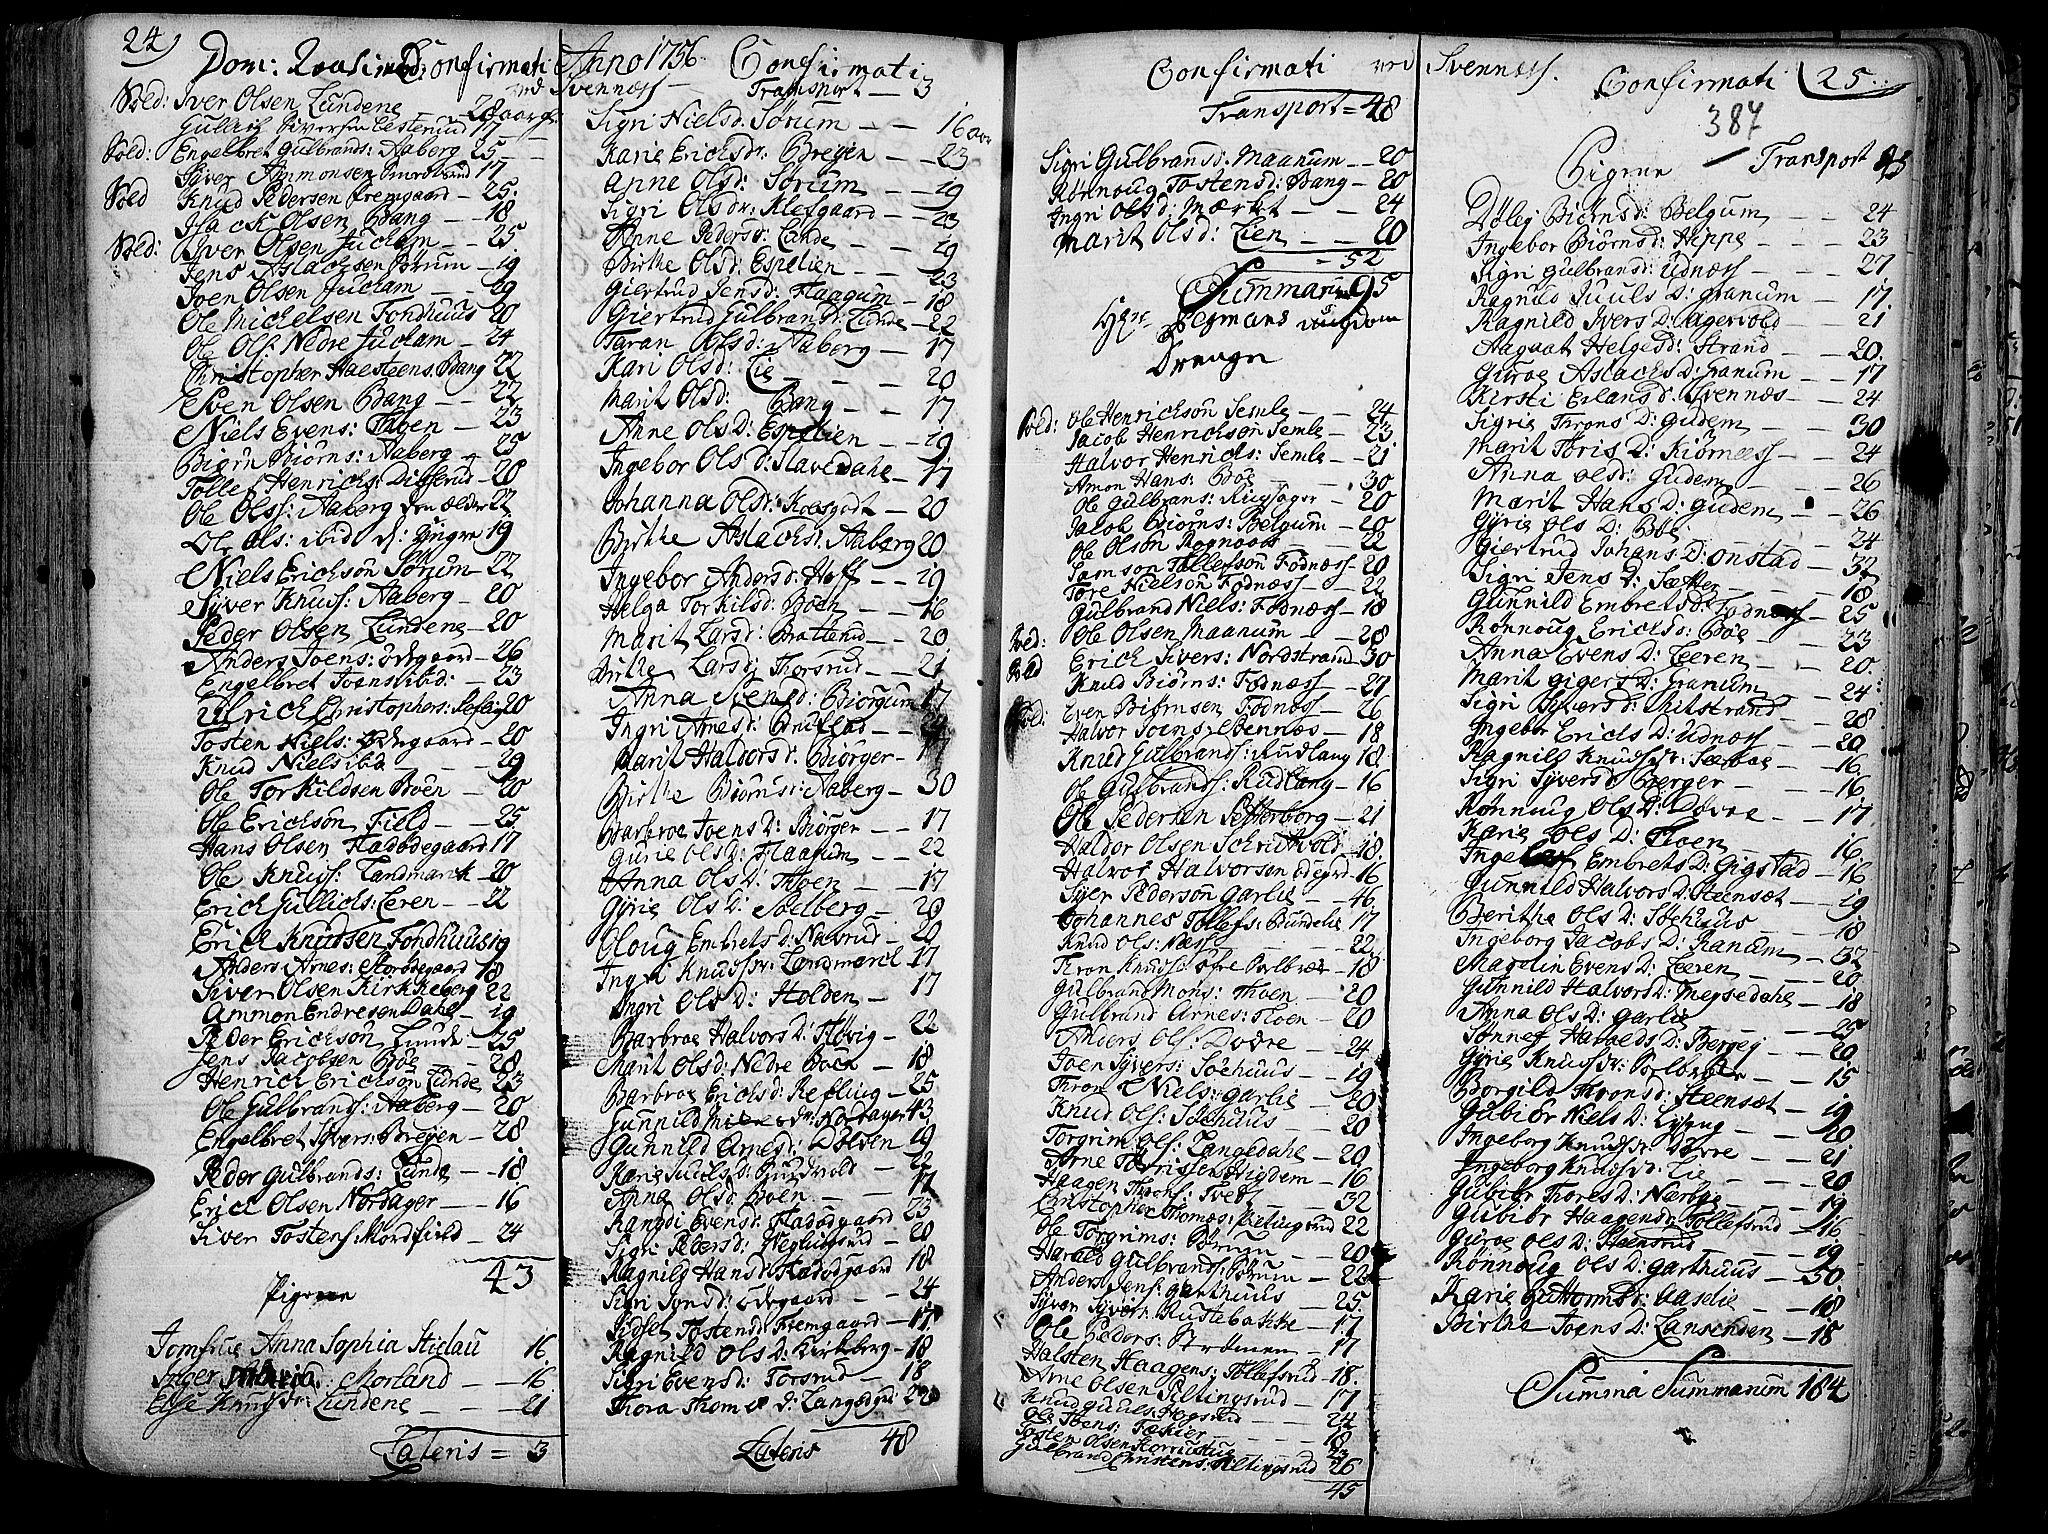 SAH, Aurdal prestekontor, Ministerialbok nr. 4, 1730-1762, s. 24-25